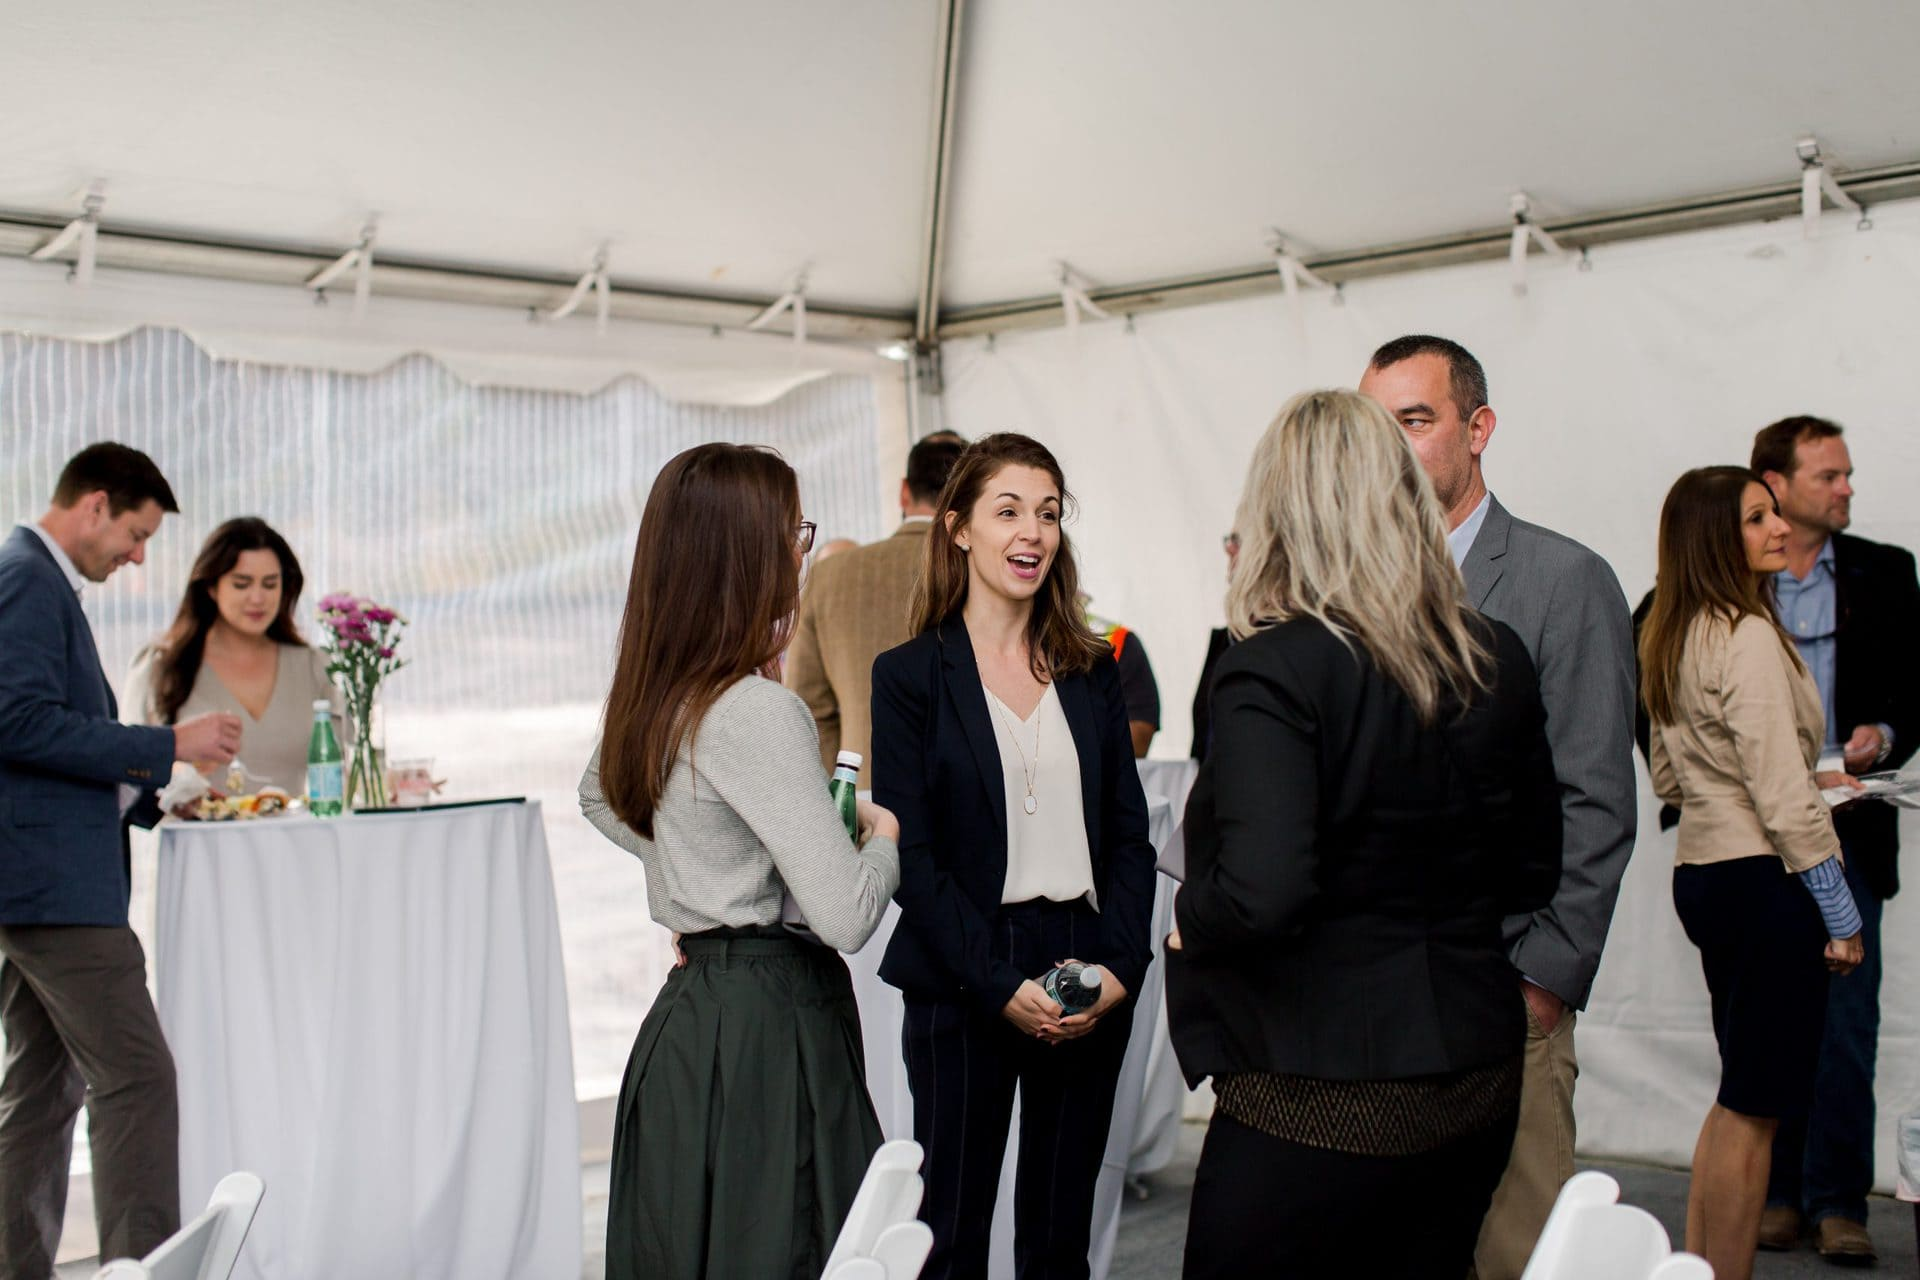 women conversation event